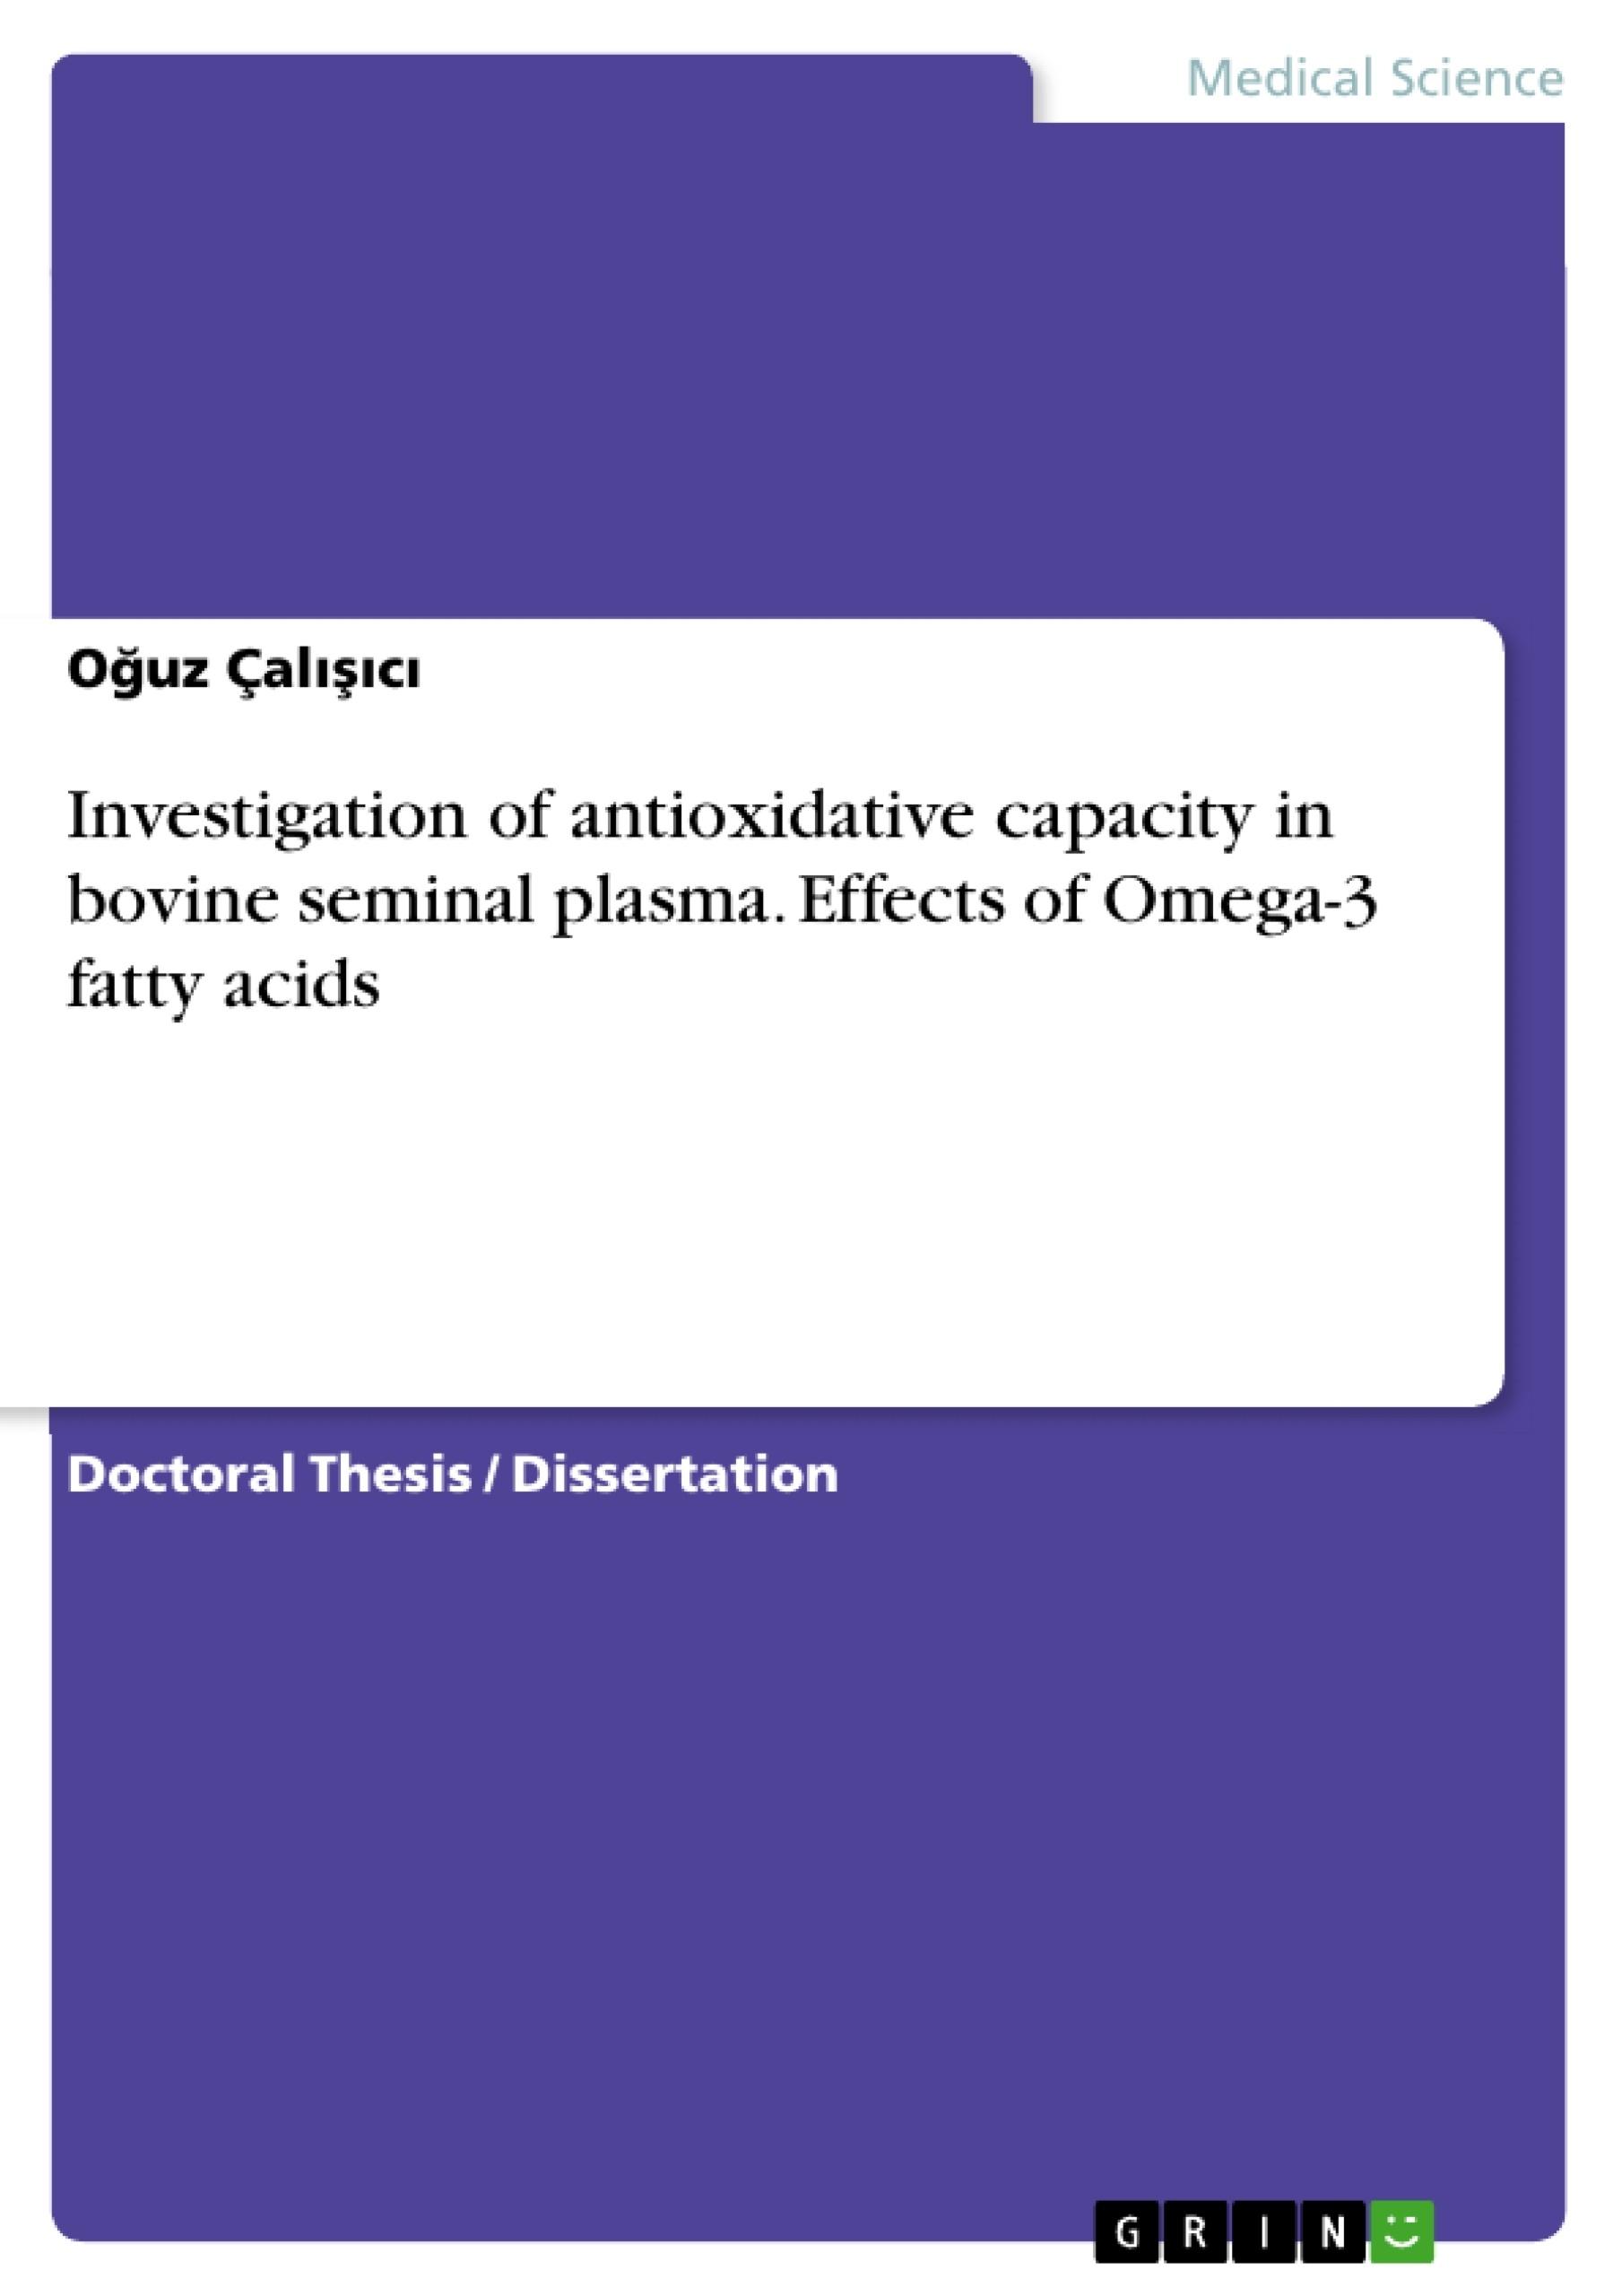 Title: Investigation of antioxidative capacity in bovine seminal plasma. Effects of Omega-3 fatty acids